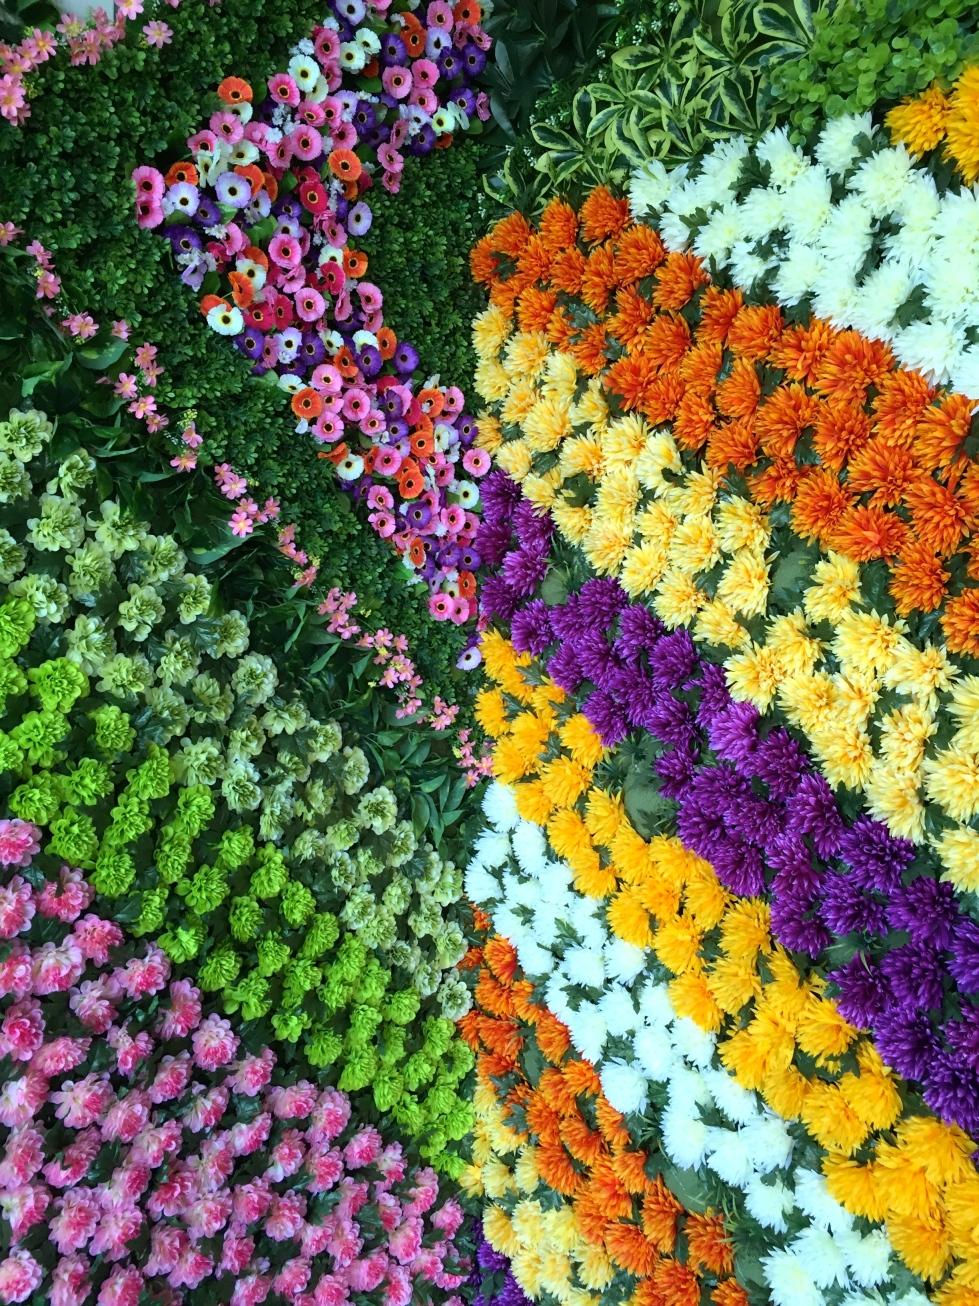 Plastic flower wall, Shenzhen, China, October 2016